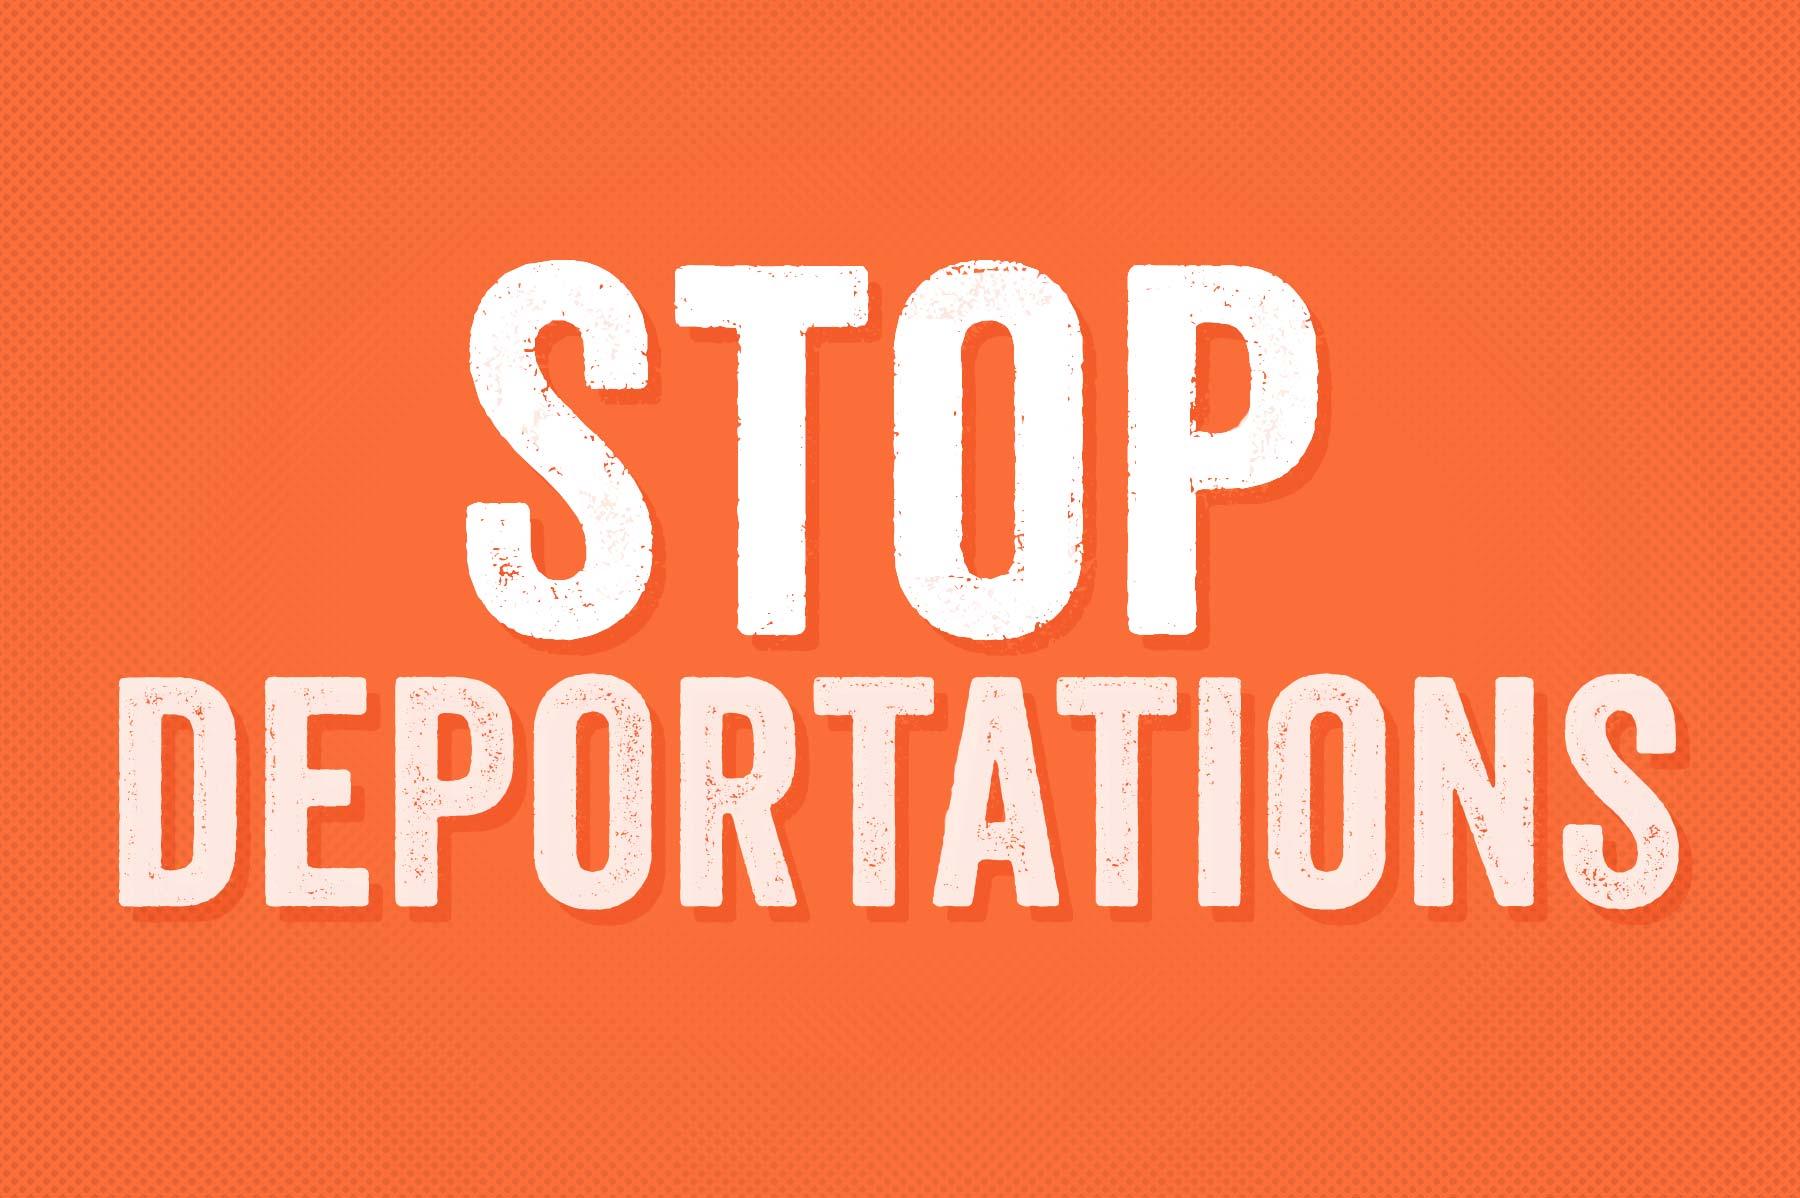 Stop deportations3